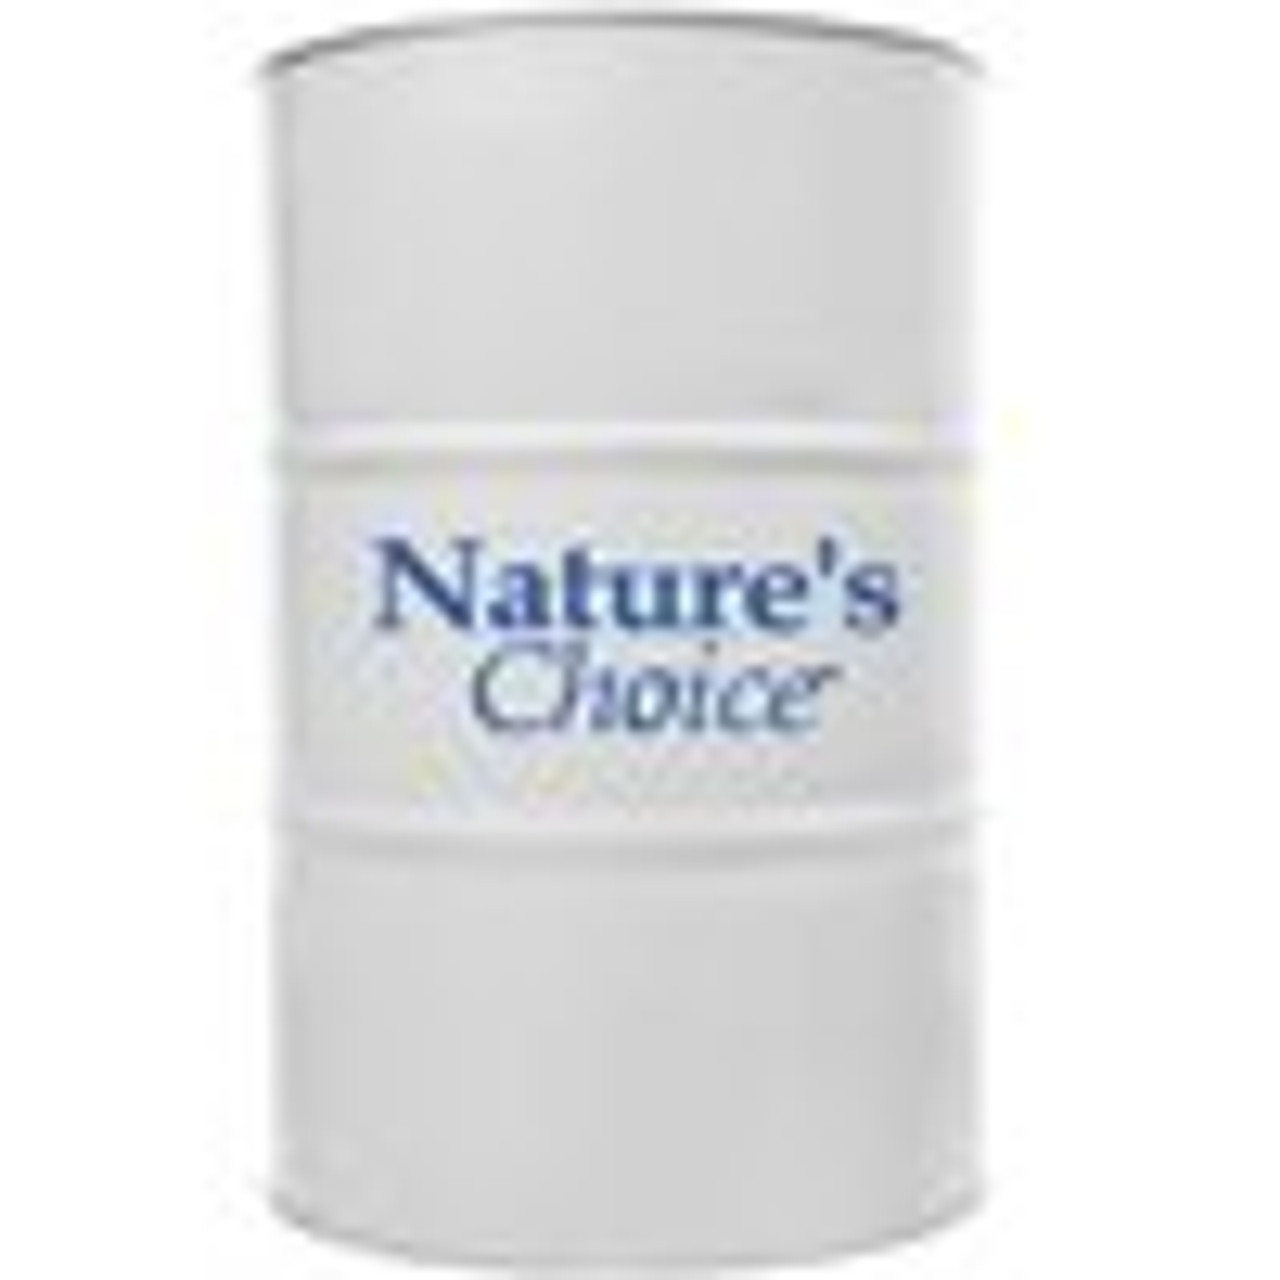 Nature's Choice Re-Refined Monograde 30W Diesel Engine Oil- 55 Gallon Drum (101113)